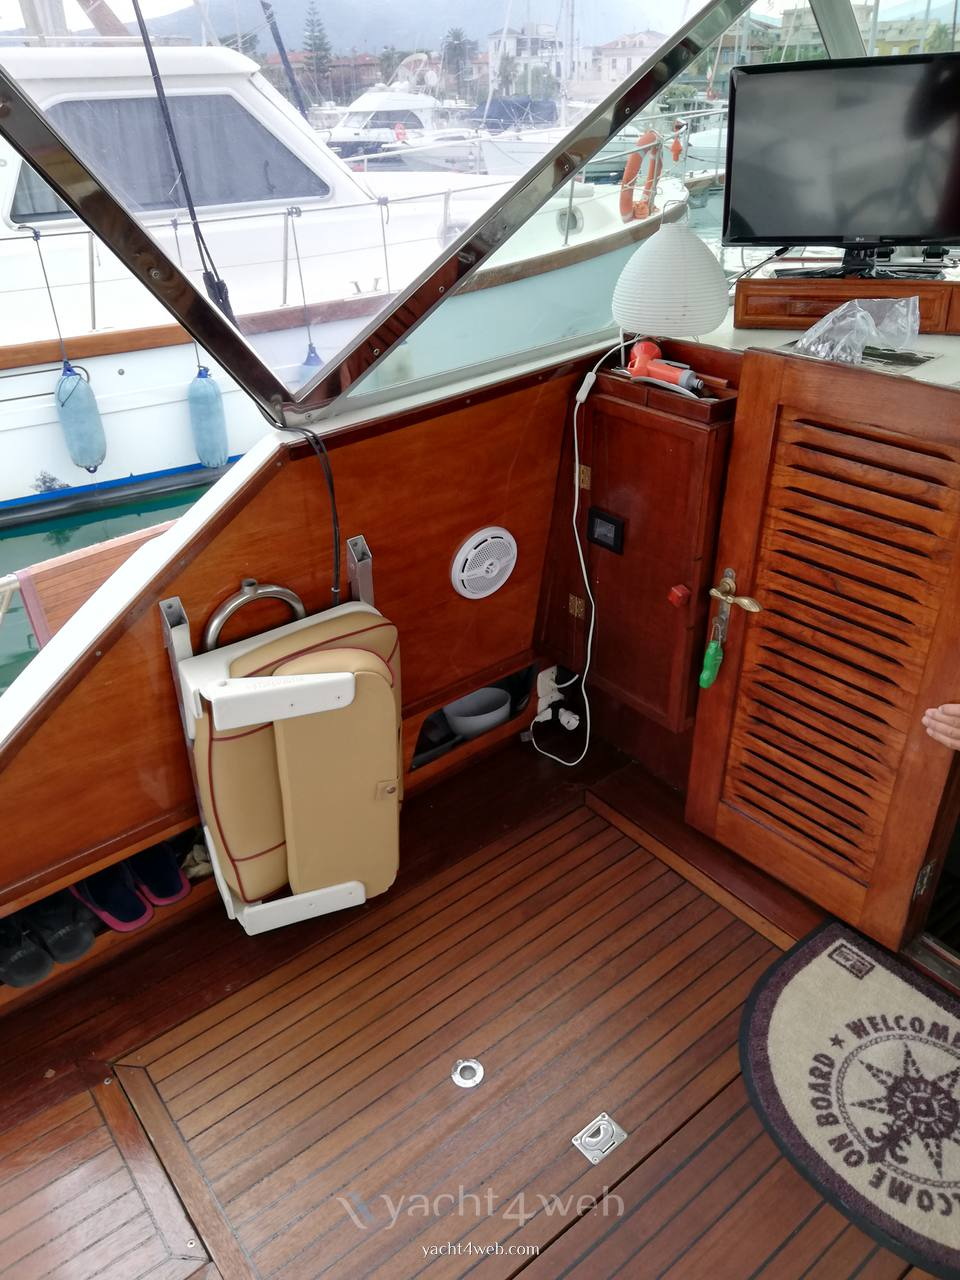 Chris-Craft Express 30 barca a motore